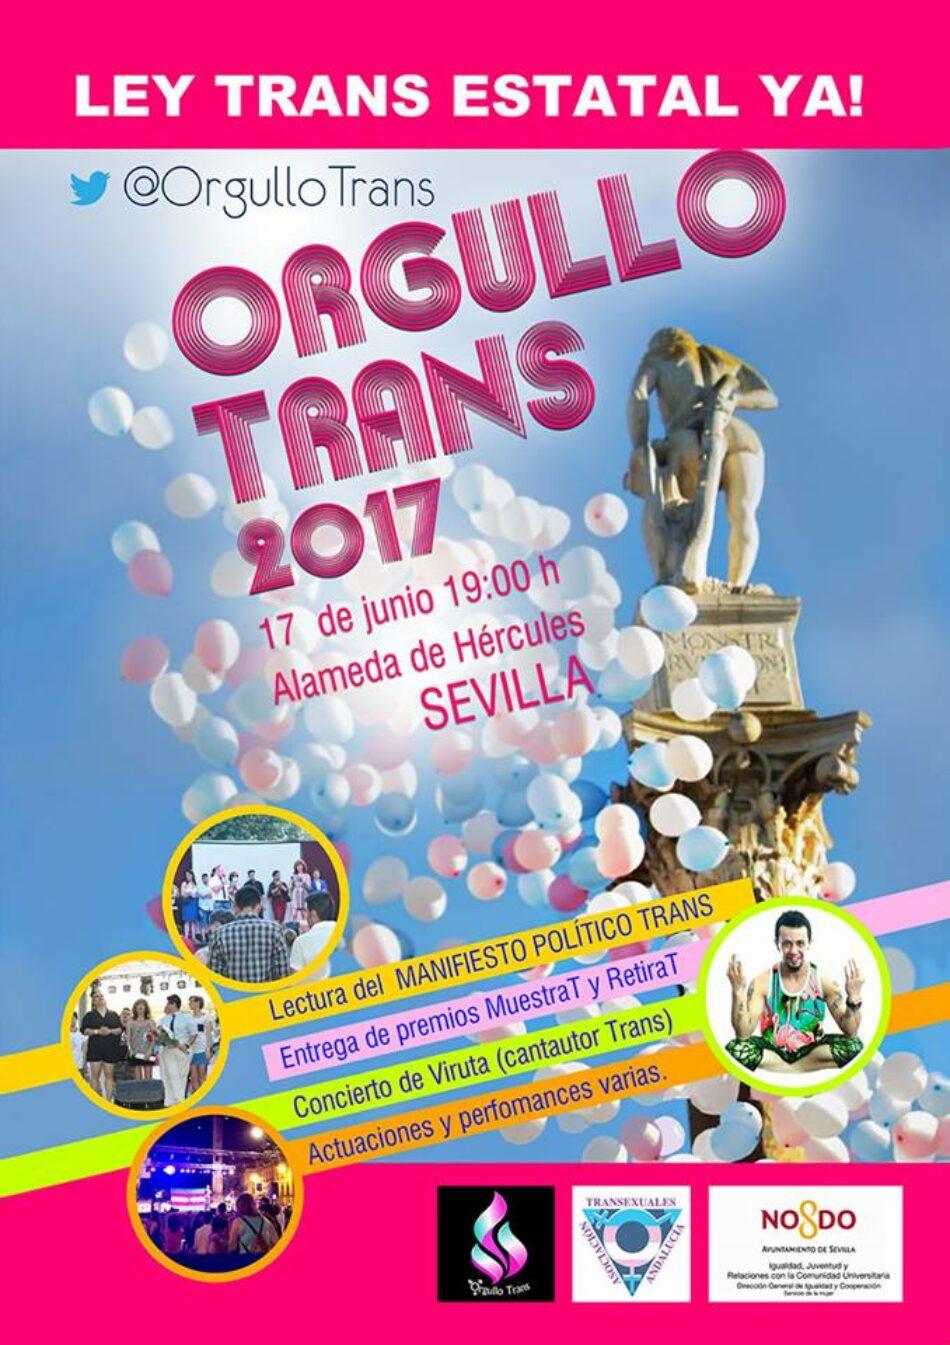 Orgullo Trans: «¡Ley Trans Estatal YA !»